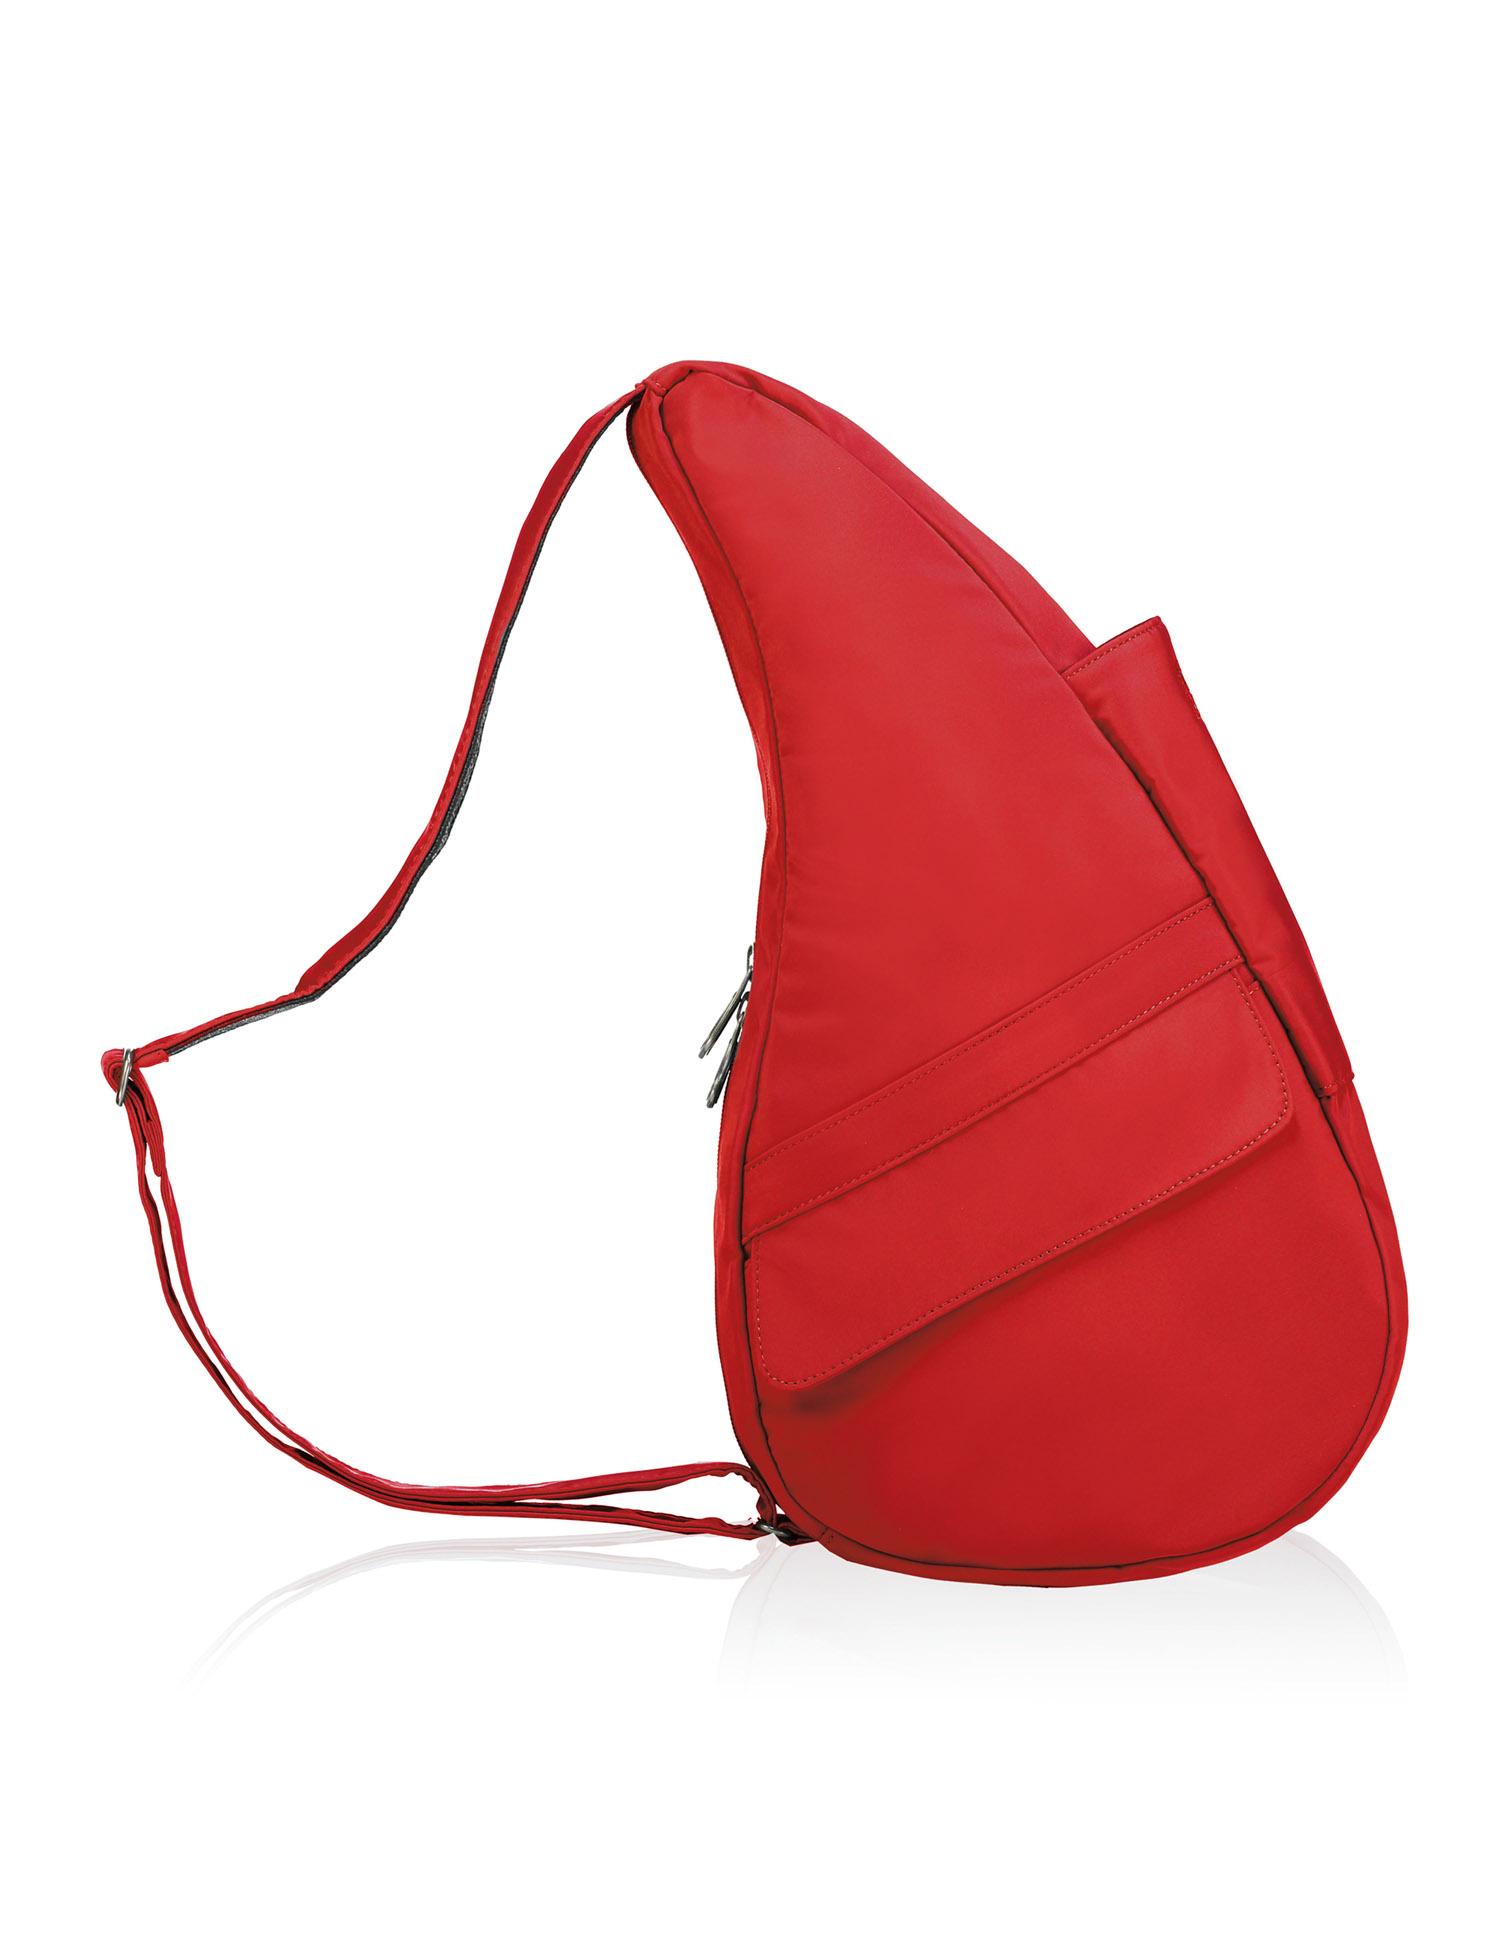 Ameribag Healthy Back Bag 174 Hbb 7103 Small Red Microfiber